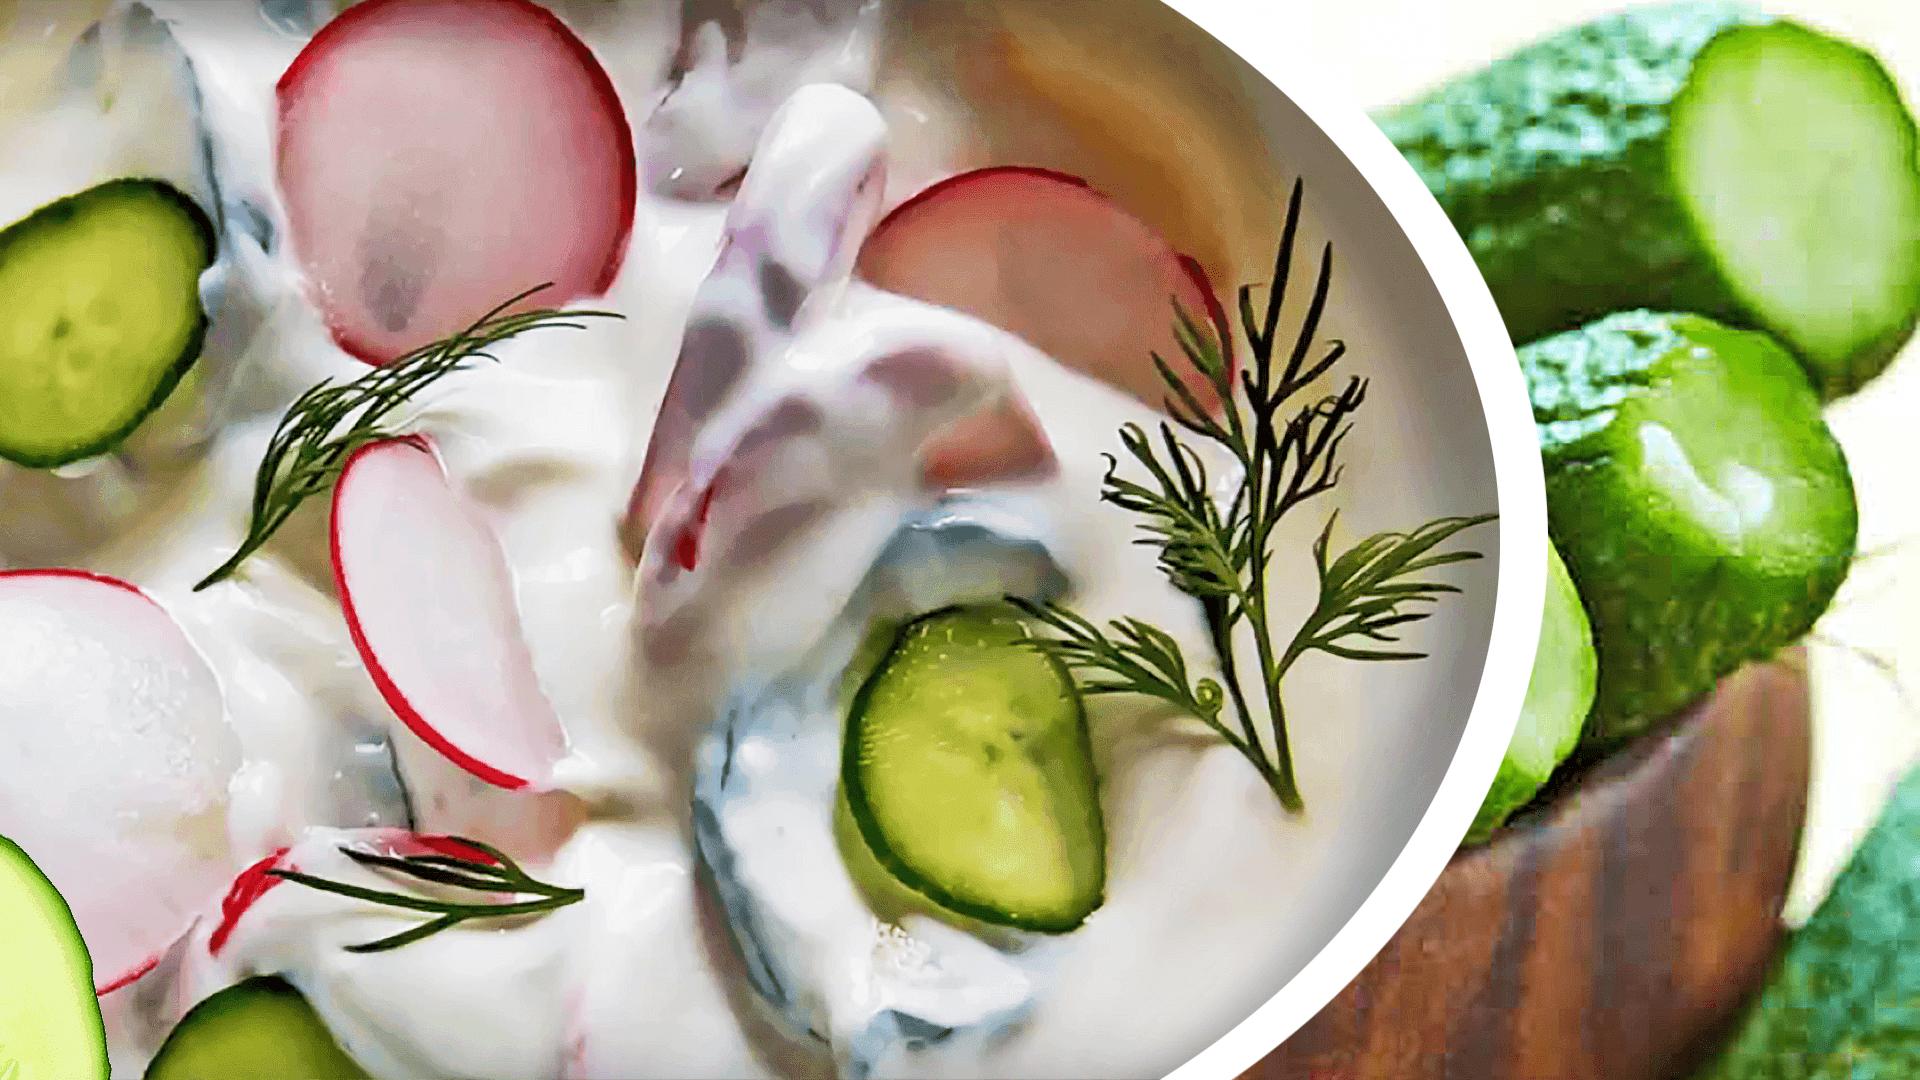 Creamy Cucumber Salad Recipe with Yogurt